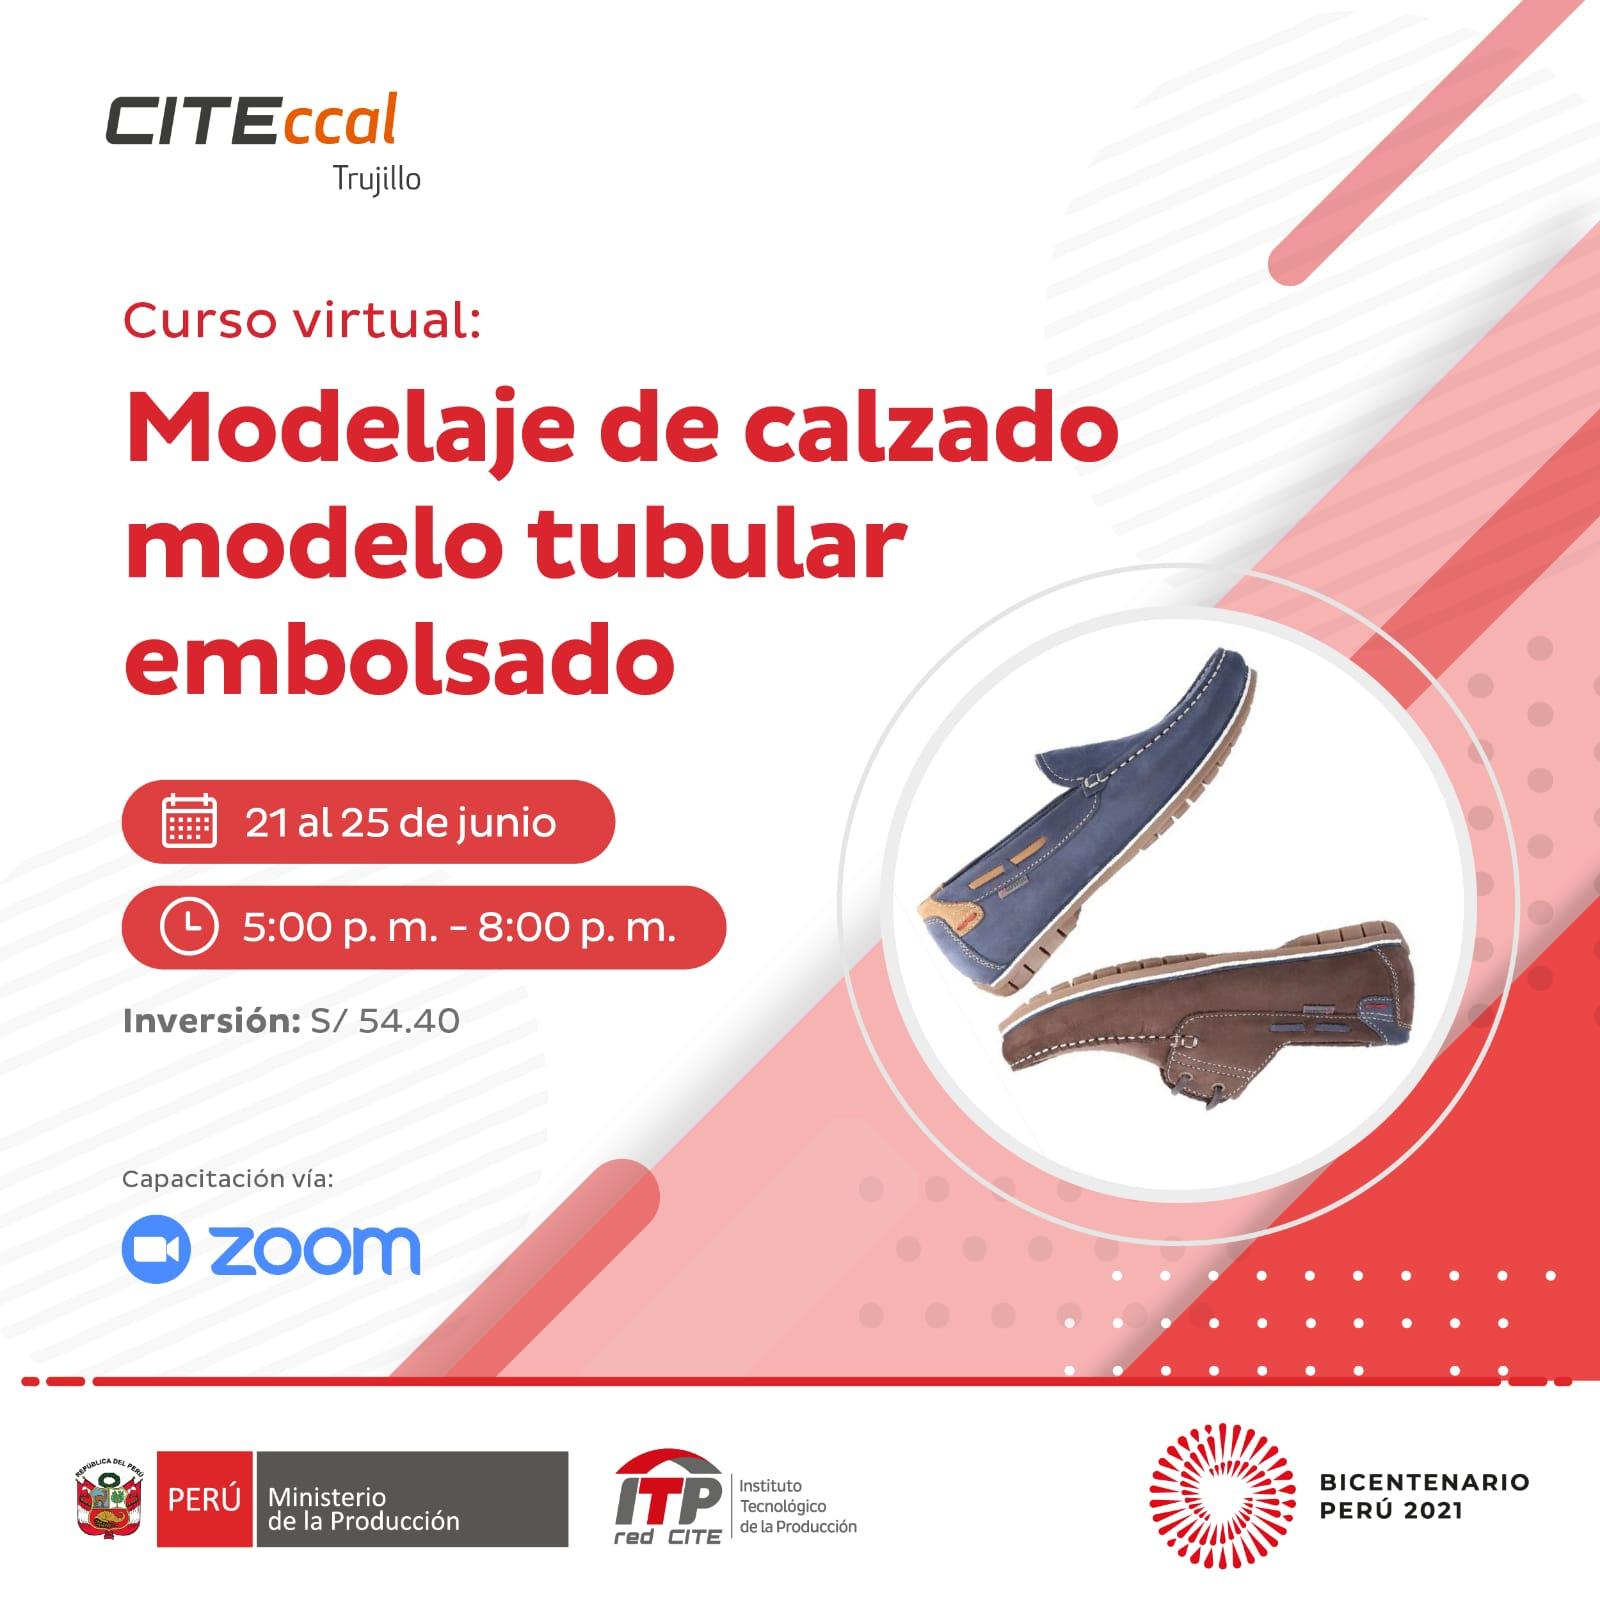 Modelaje de calzado modelo tubular embolsado